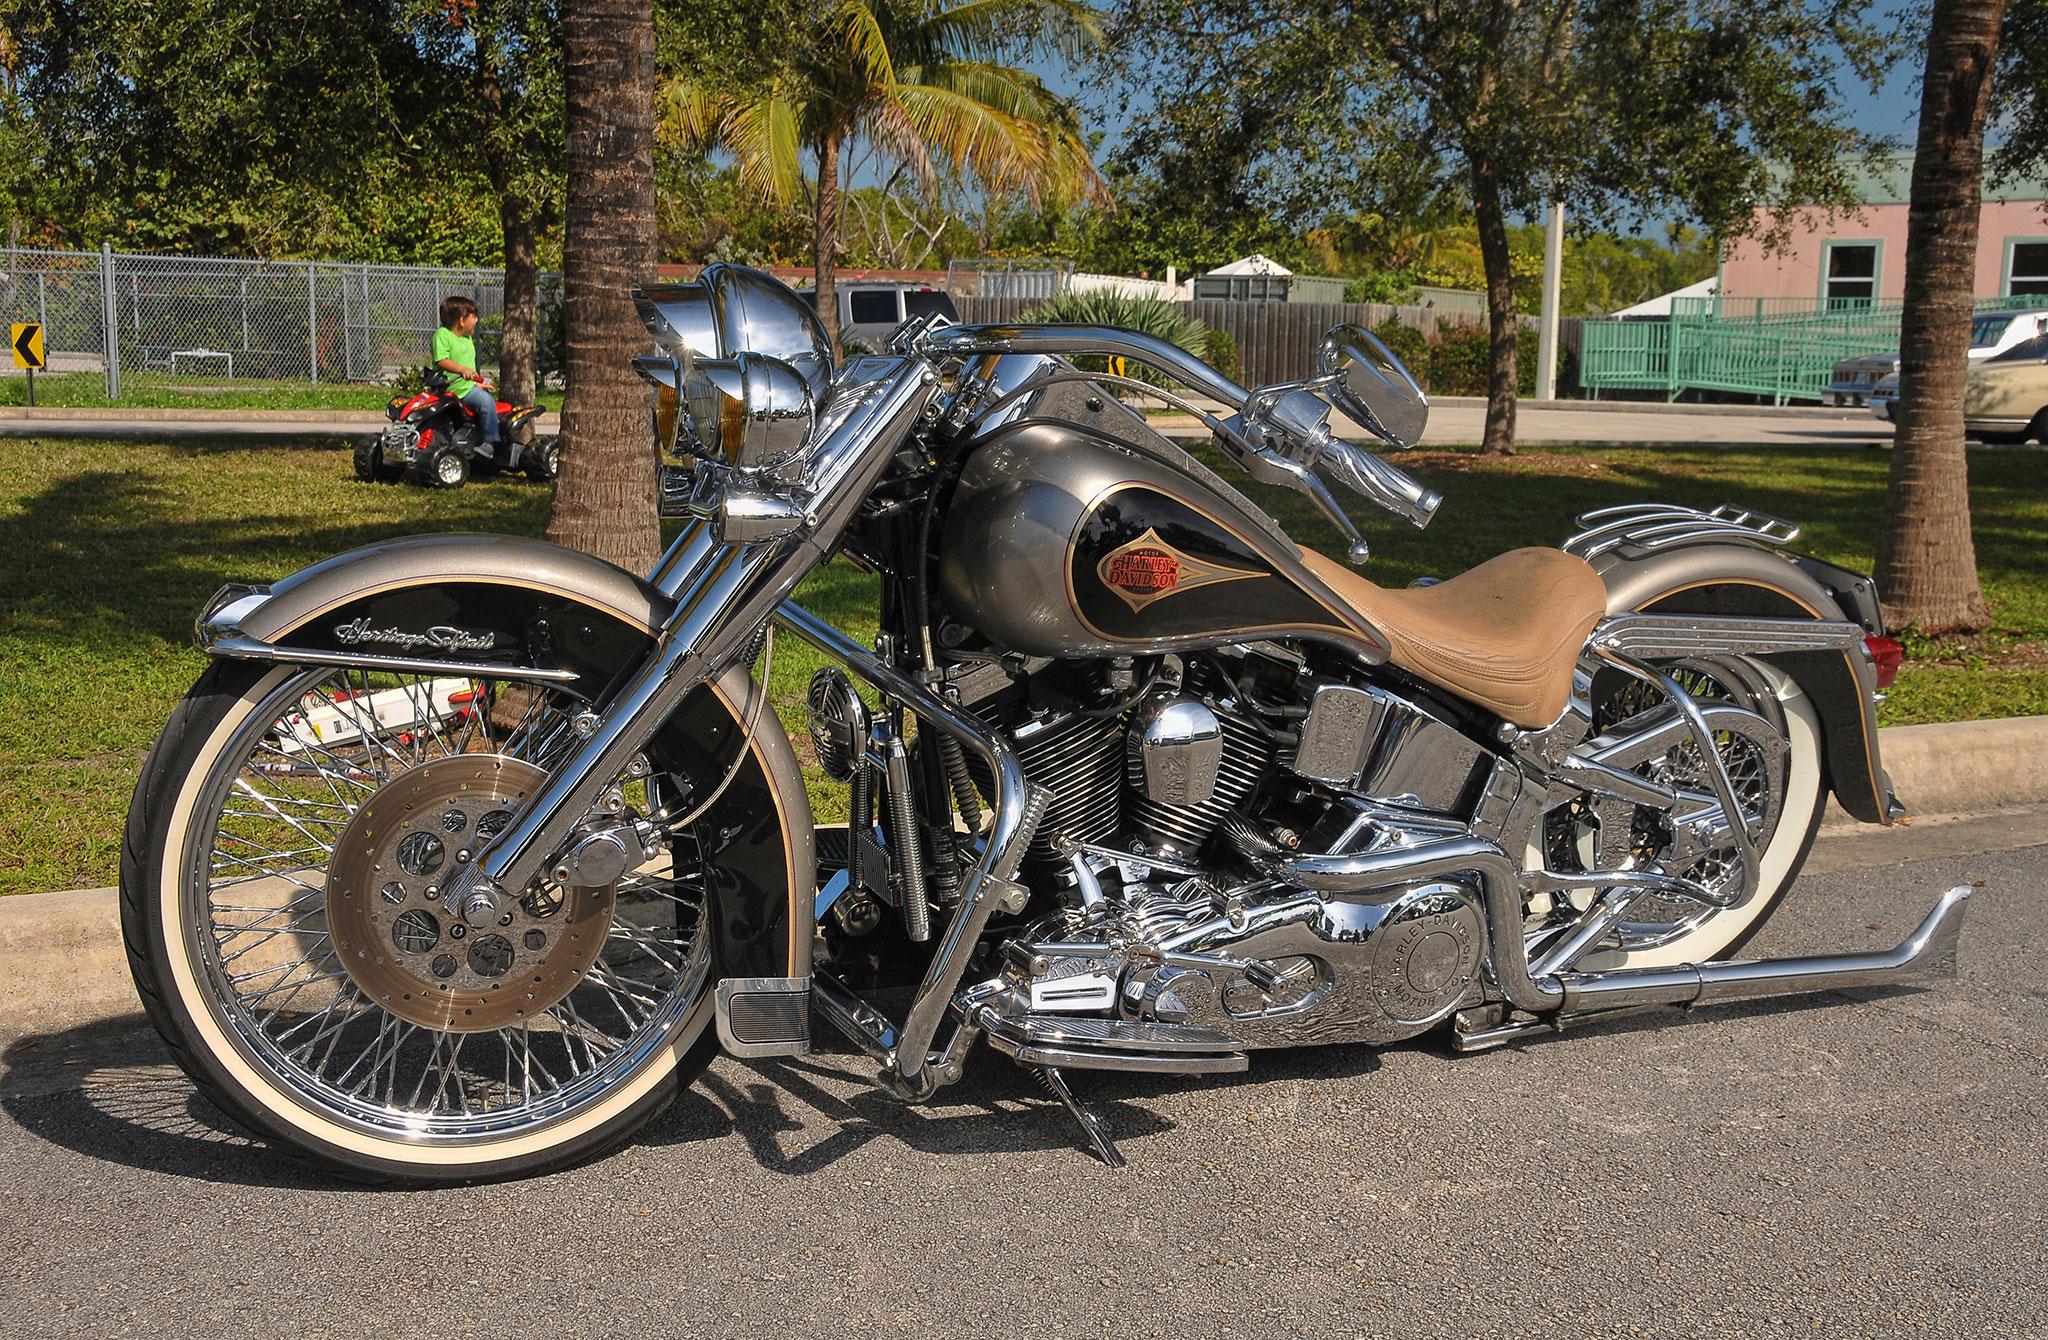 Lowrider Miami >> 25th-street-riders-USO-annual-picnic-harley-davidson-heritage-softail-38 - Lowrider